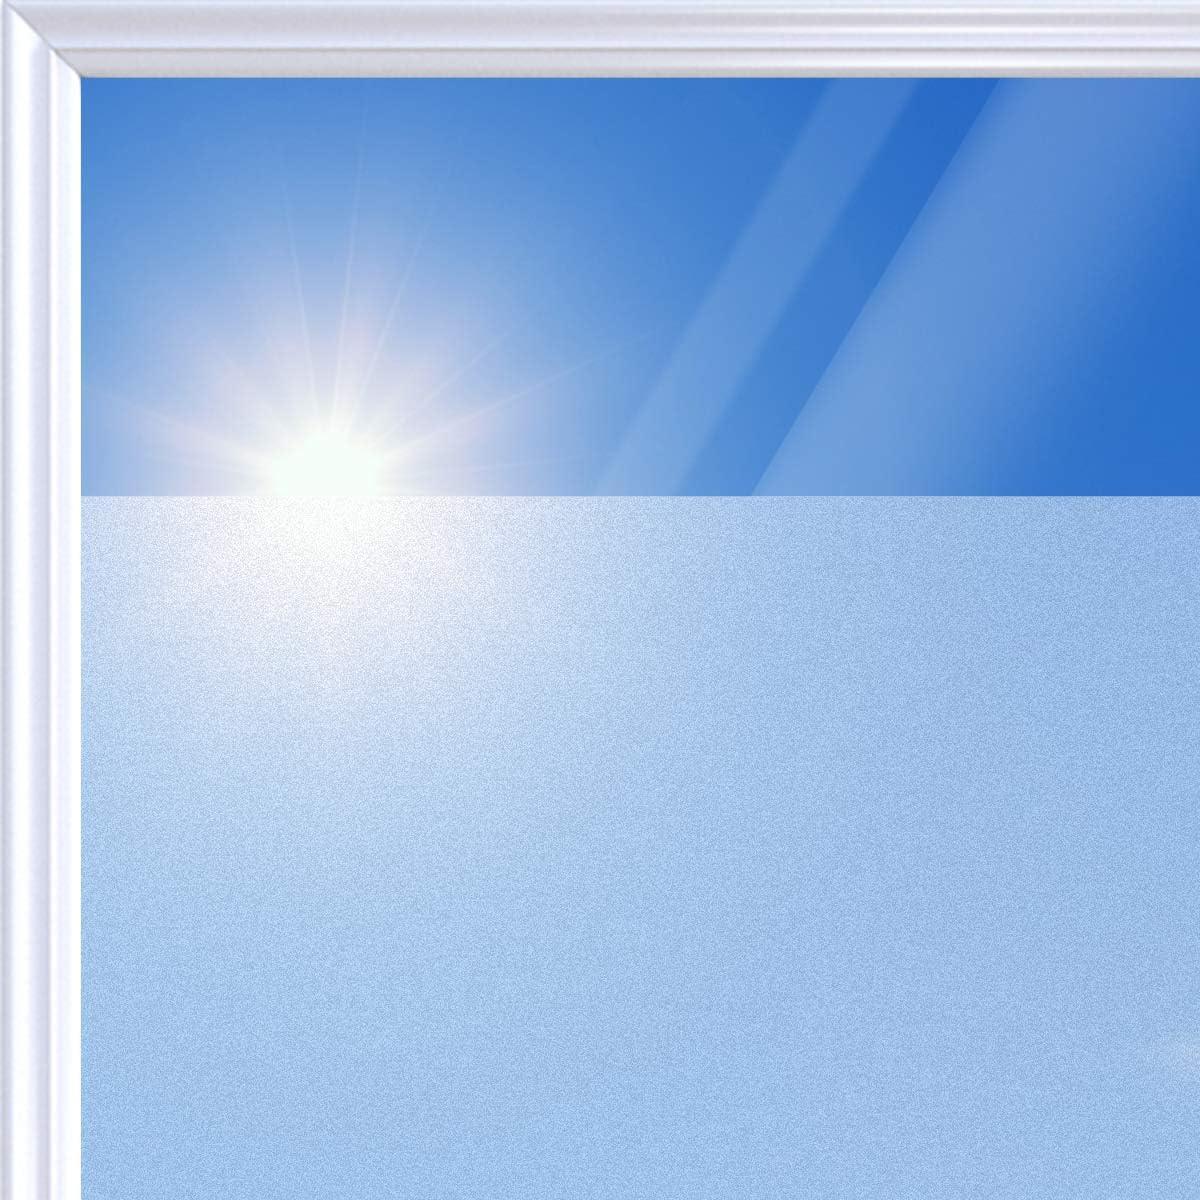 Navaris Lámina Adhesiva para Cristal - Vinilo translúcido para Ventana - Adhesivo para despacho Sala de reuniones casa Ducha - Rollo de 90 x 200M